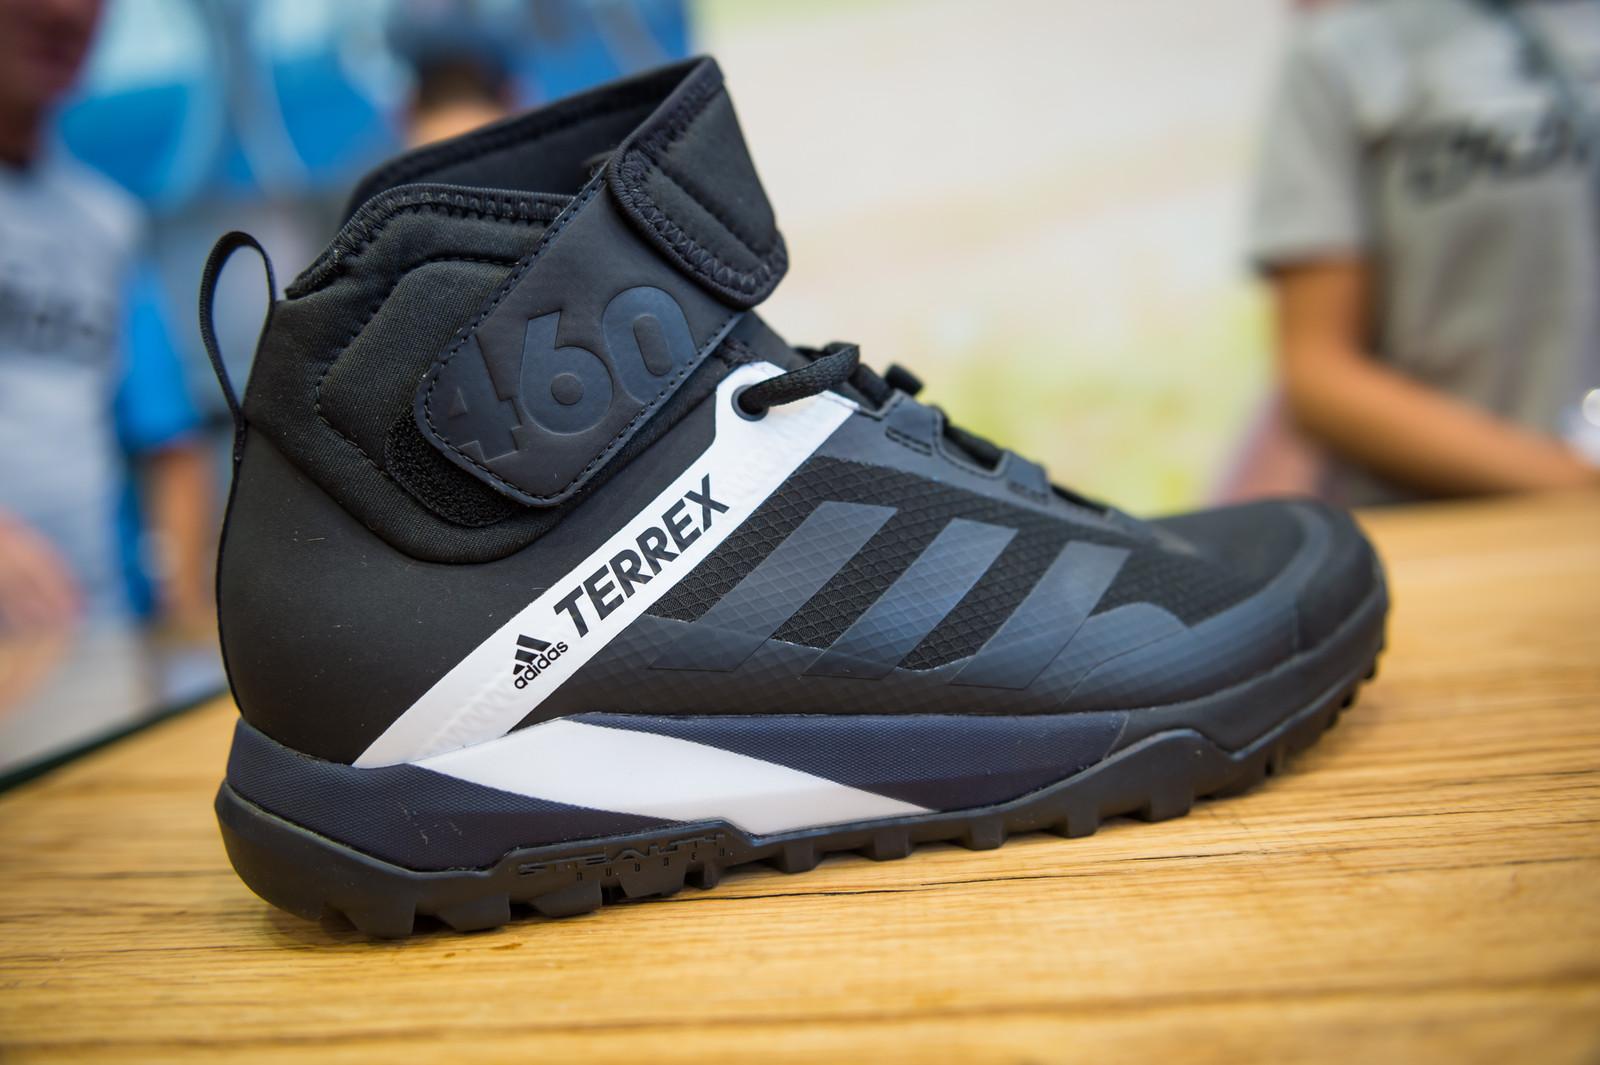 Adidas Terrex Trailcross Protect Shoe - Eurobike 2017